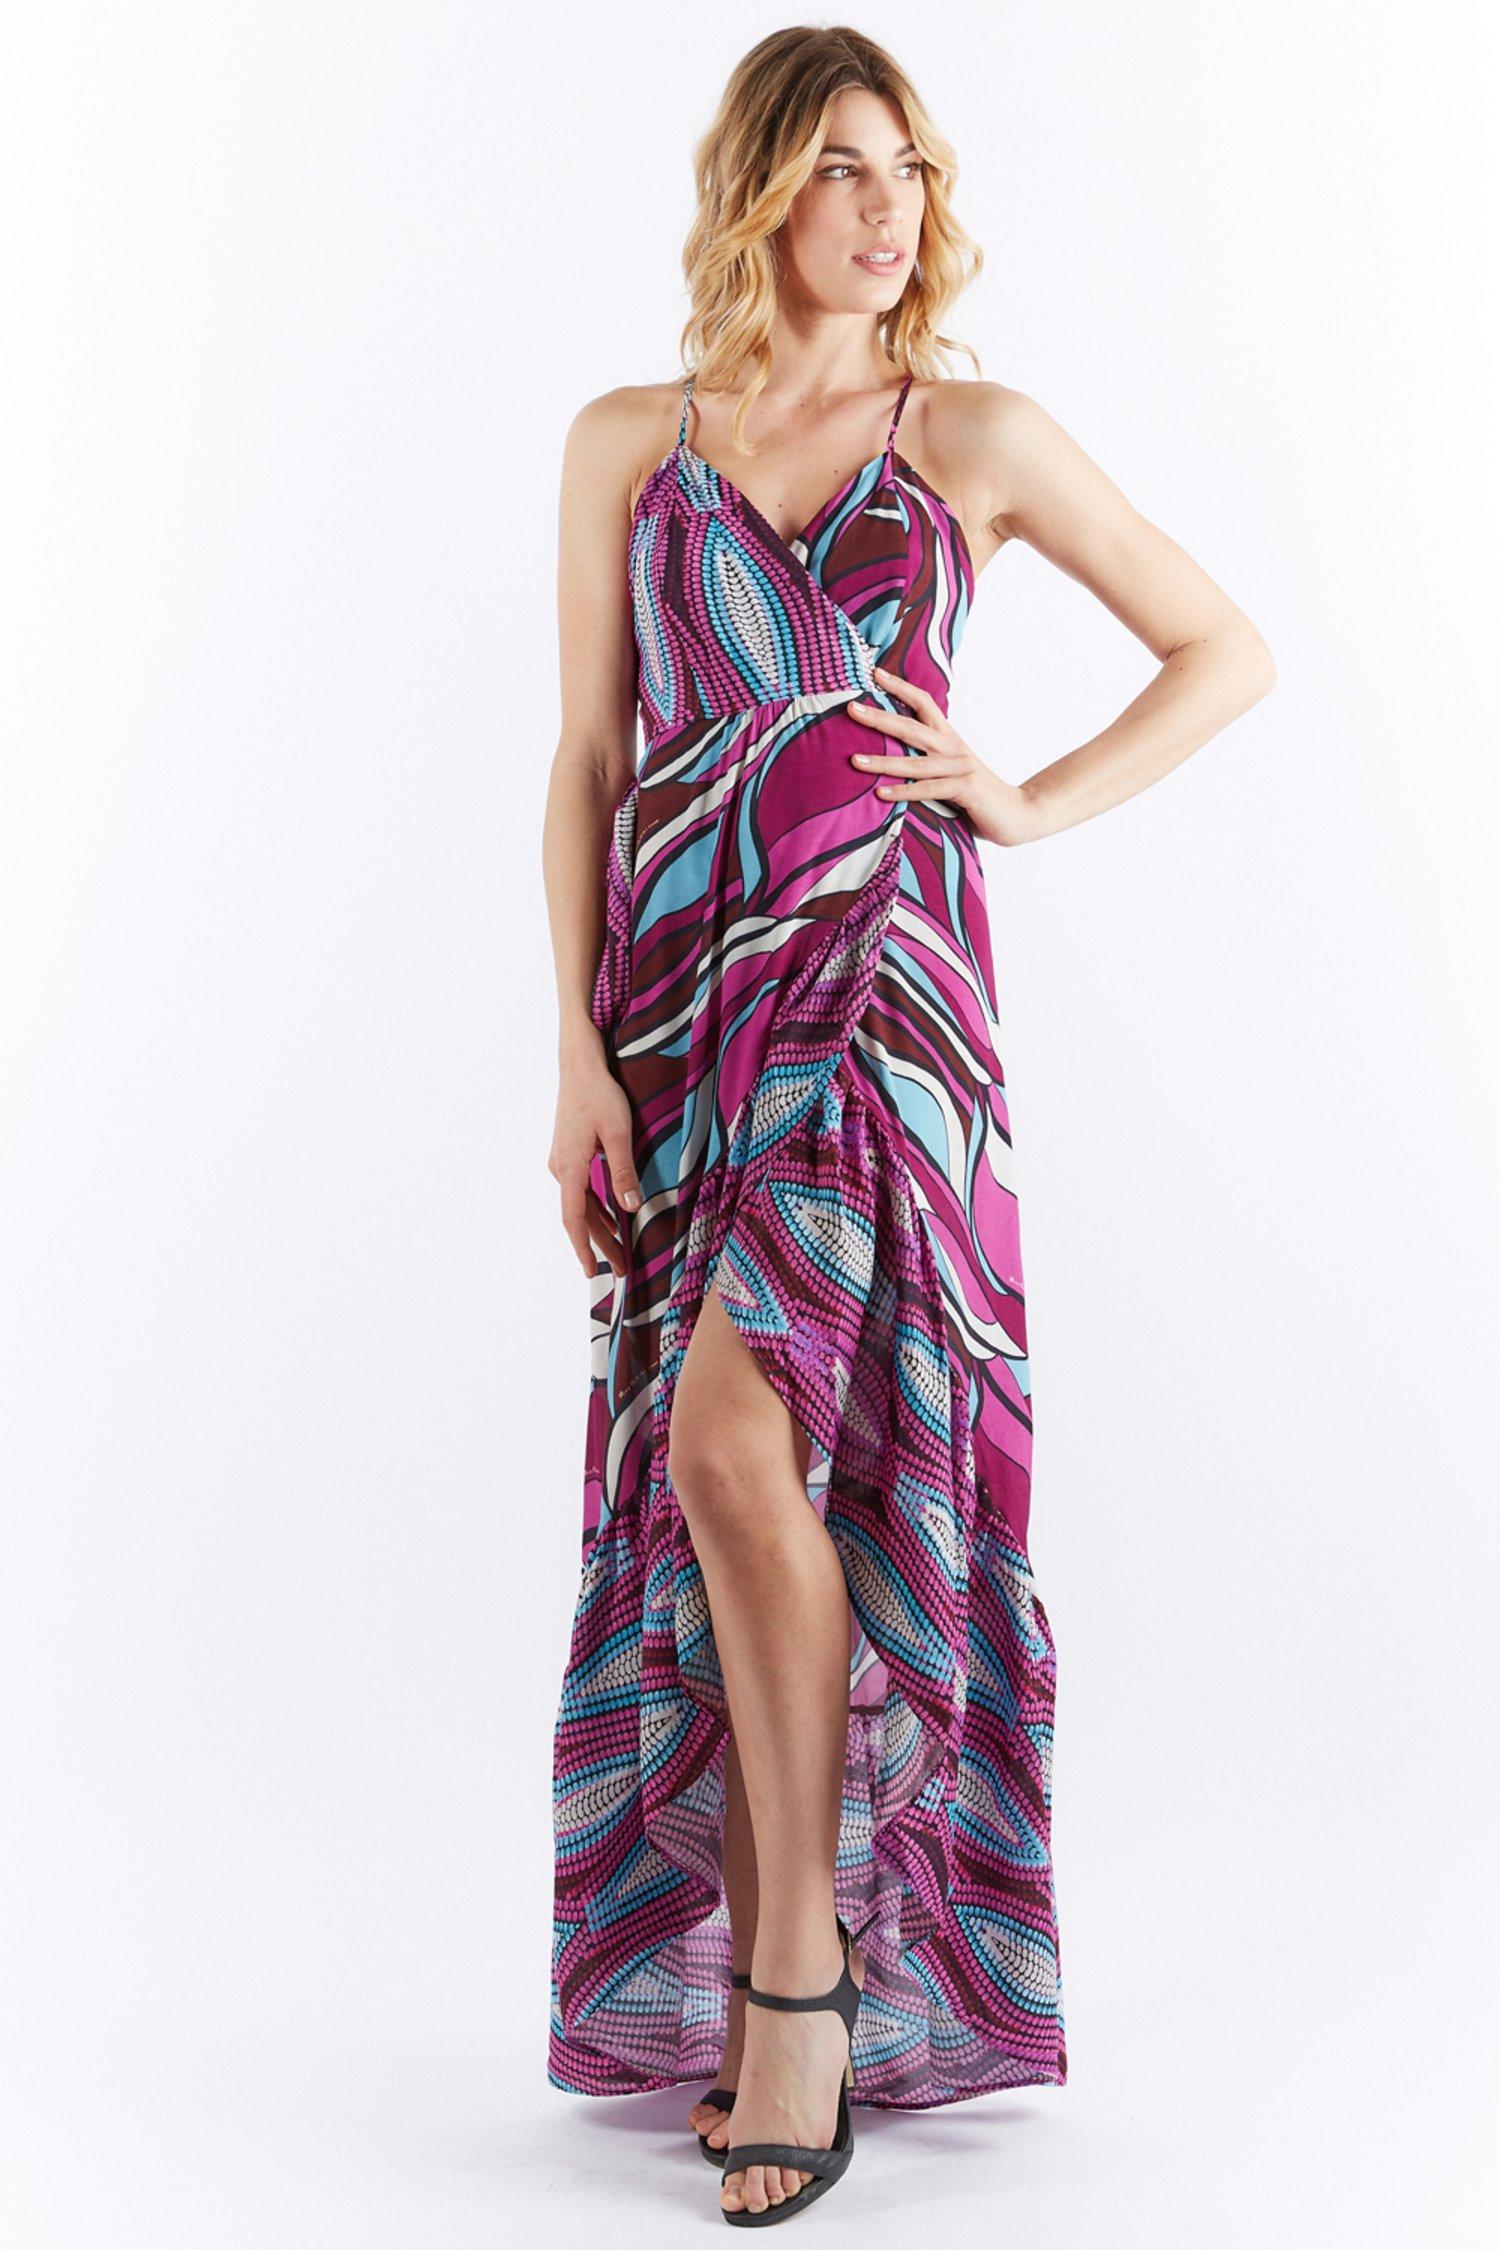 LONG ASYMMETRIC DRESS - Kenia Fuxia